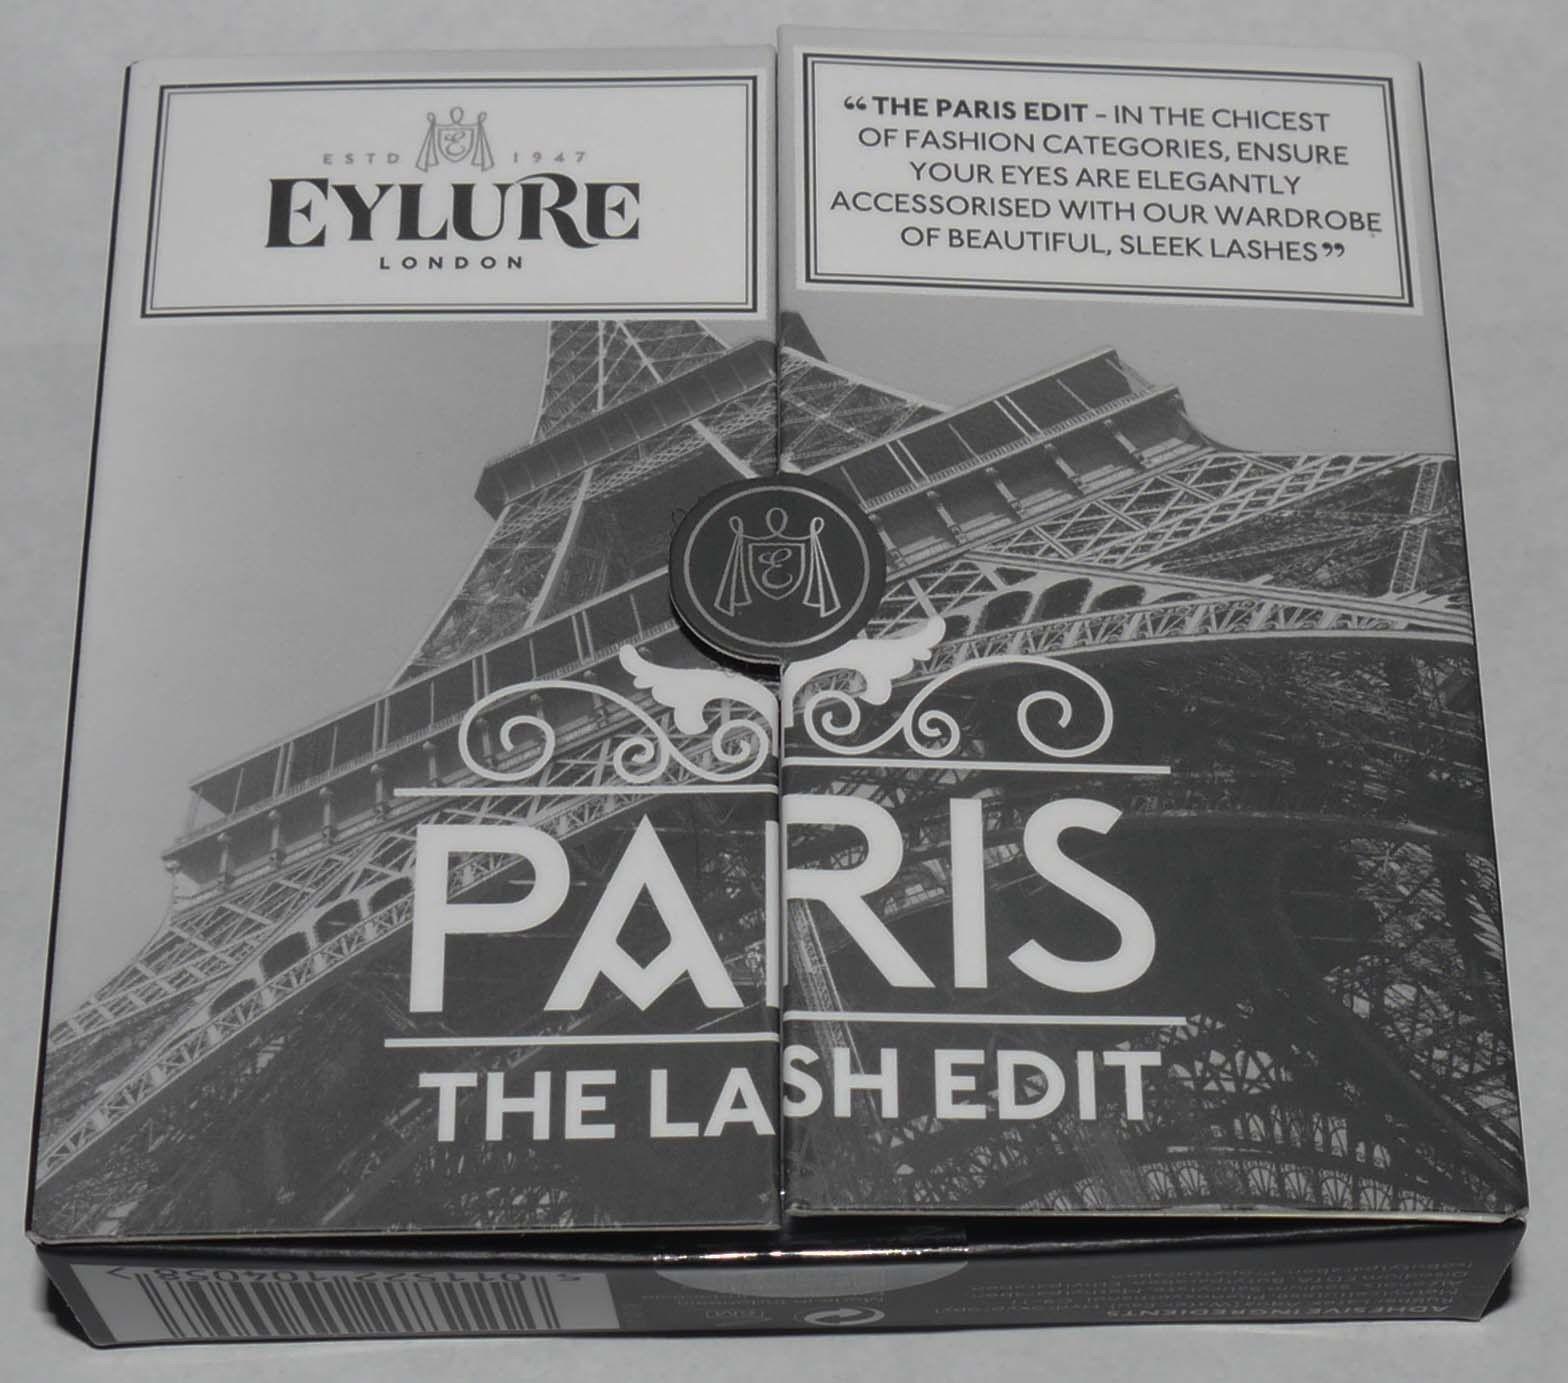 Eylure London Set of 3 The Lash Edit - Paris Re-Usable False Eye Lashes 13832